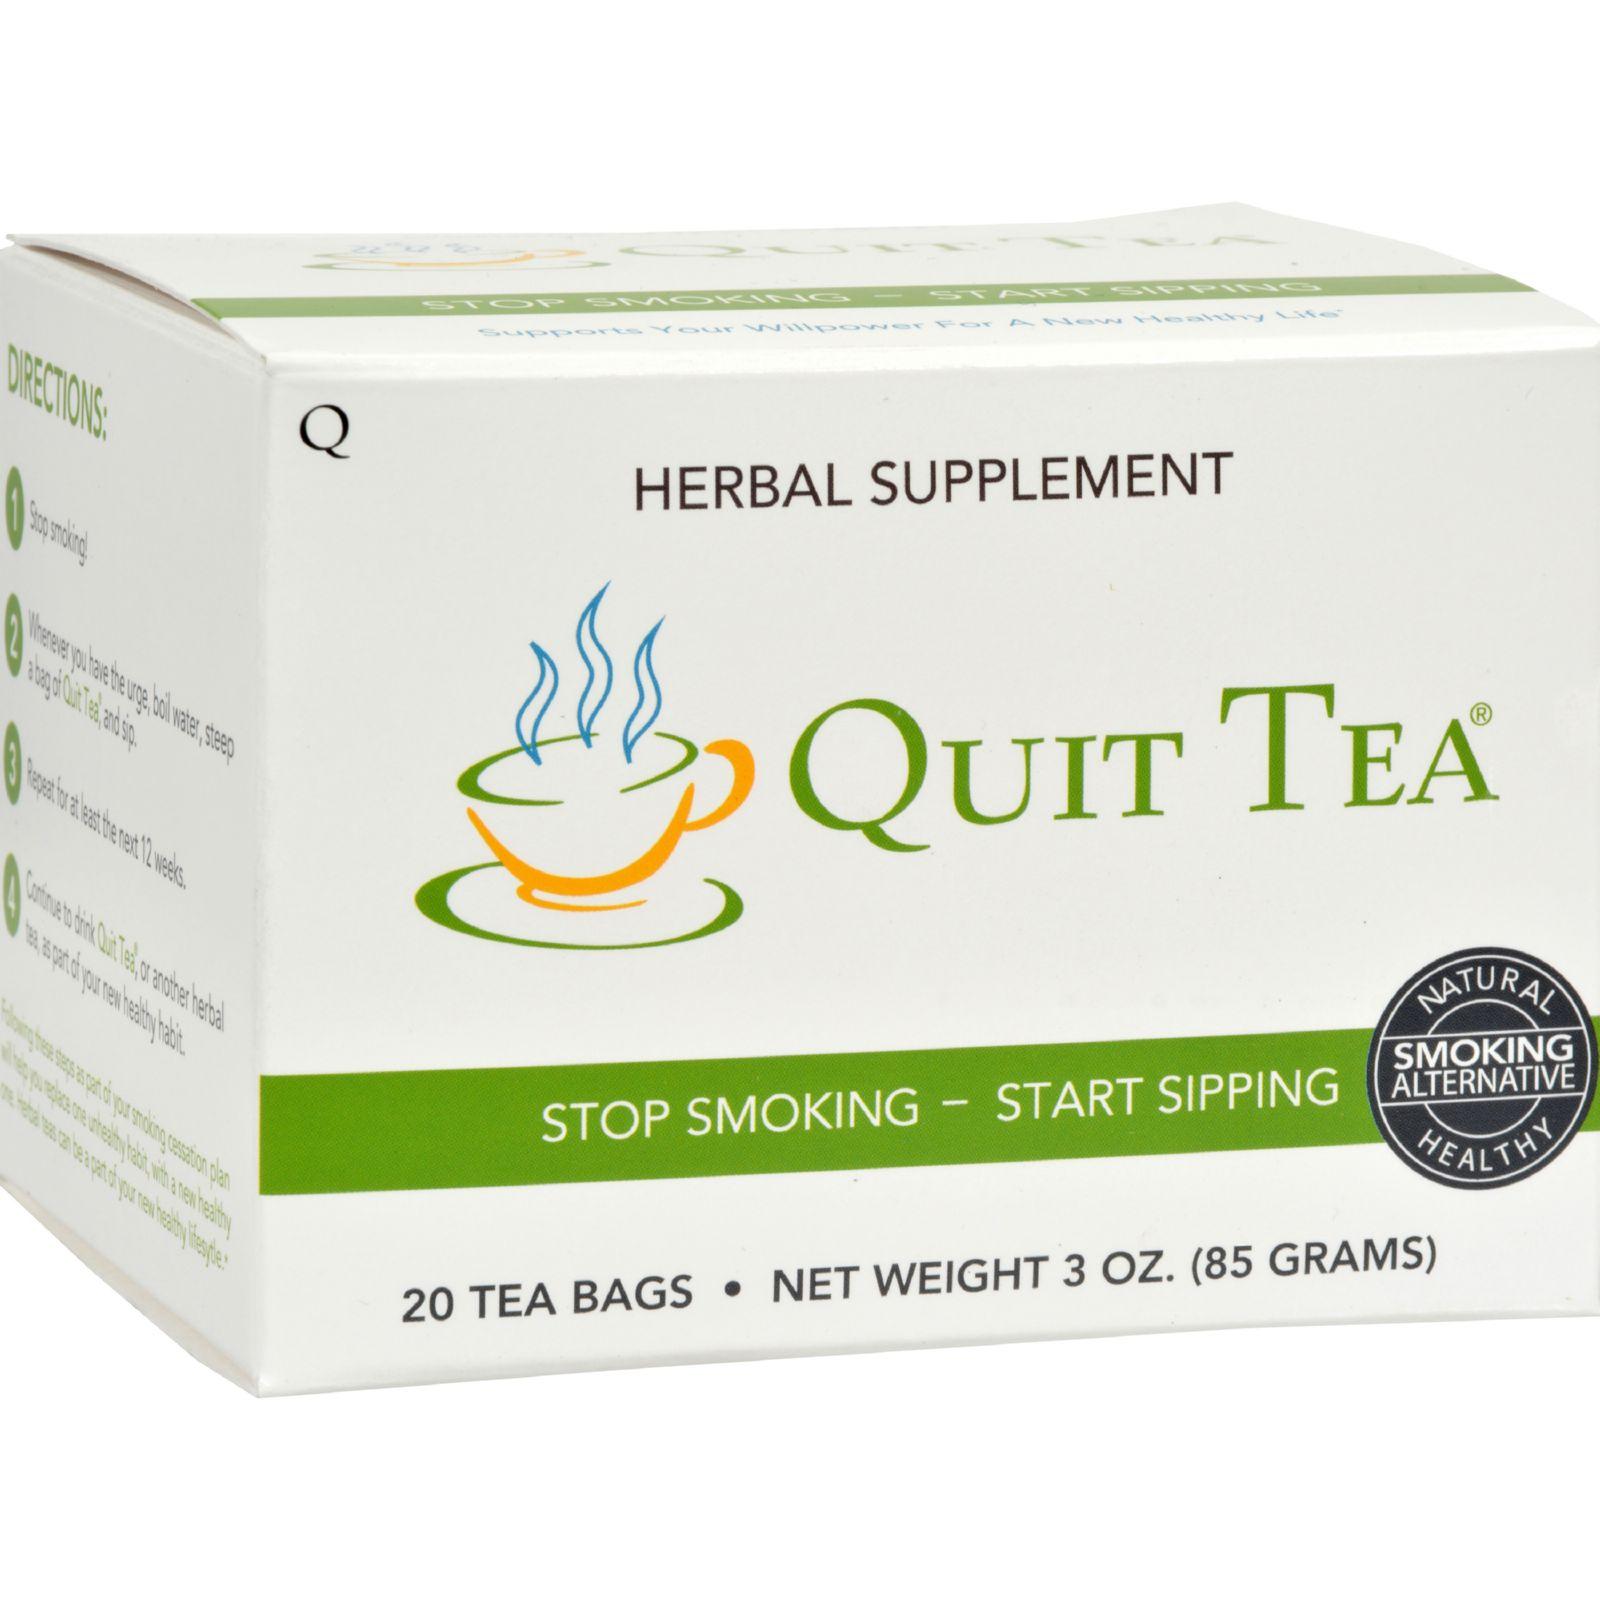 Quit Tea Stop Smoking Tea - 20 Tea Bags